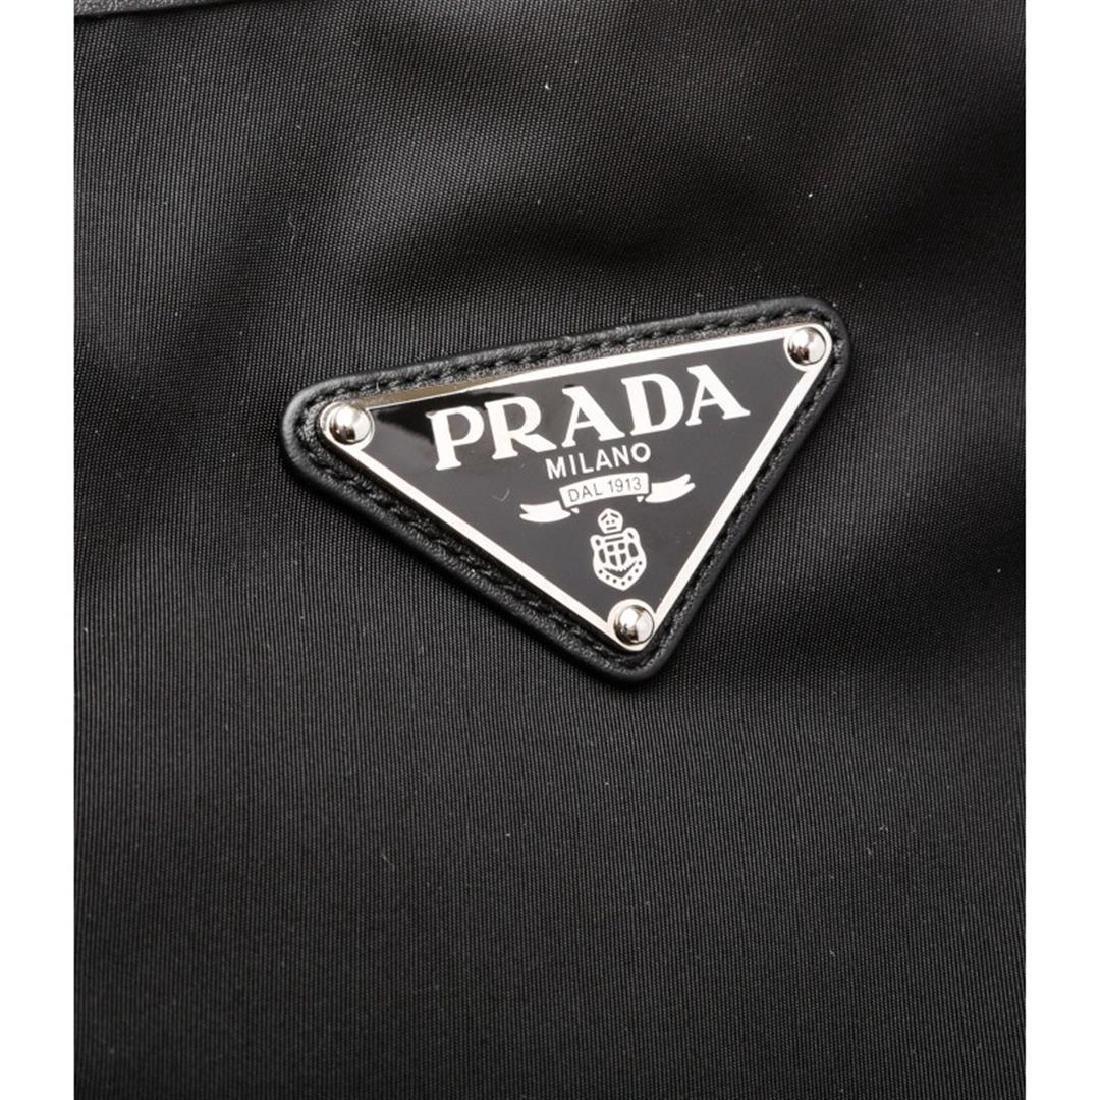 Prada Black Nylon Leather Long Tote Shoulder Bag - 7